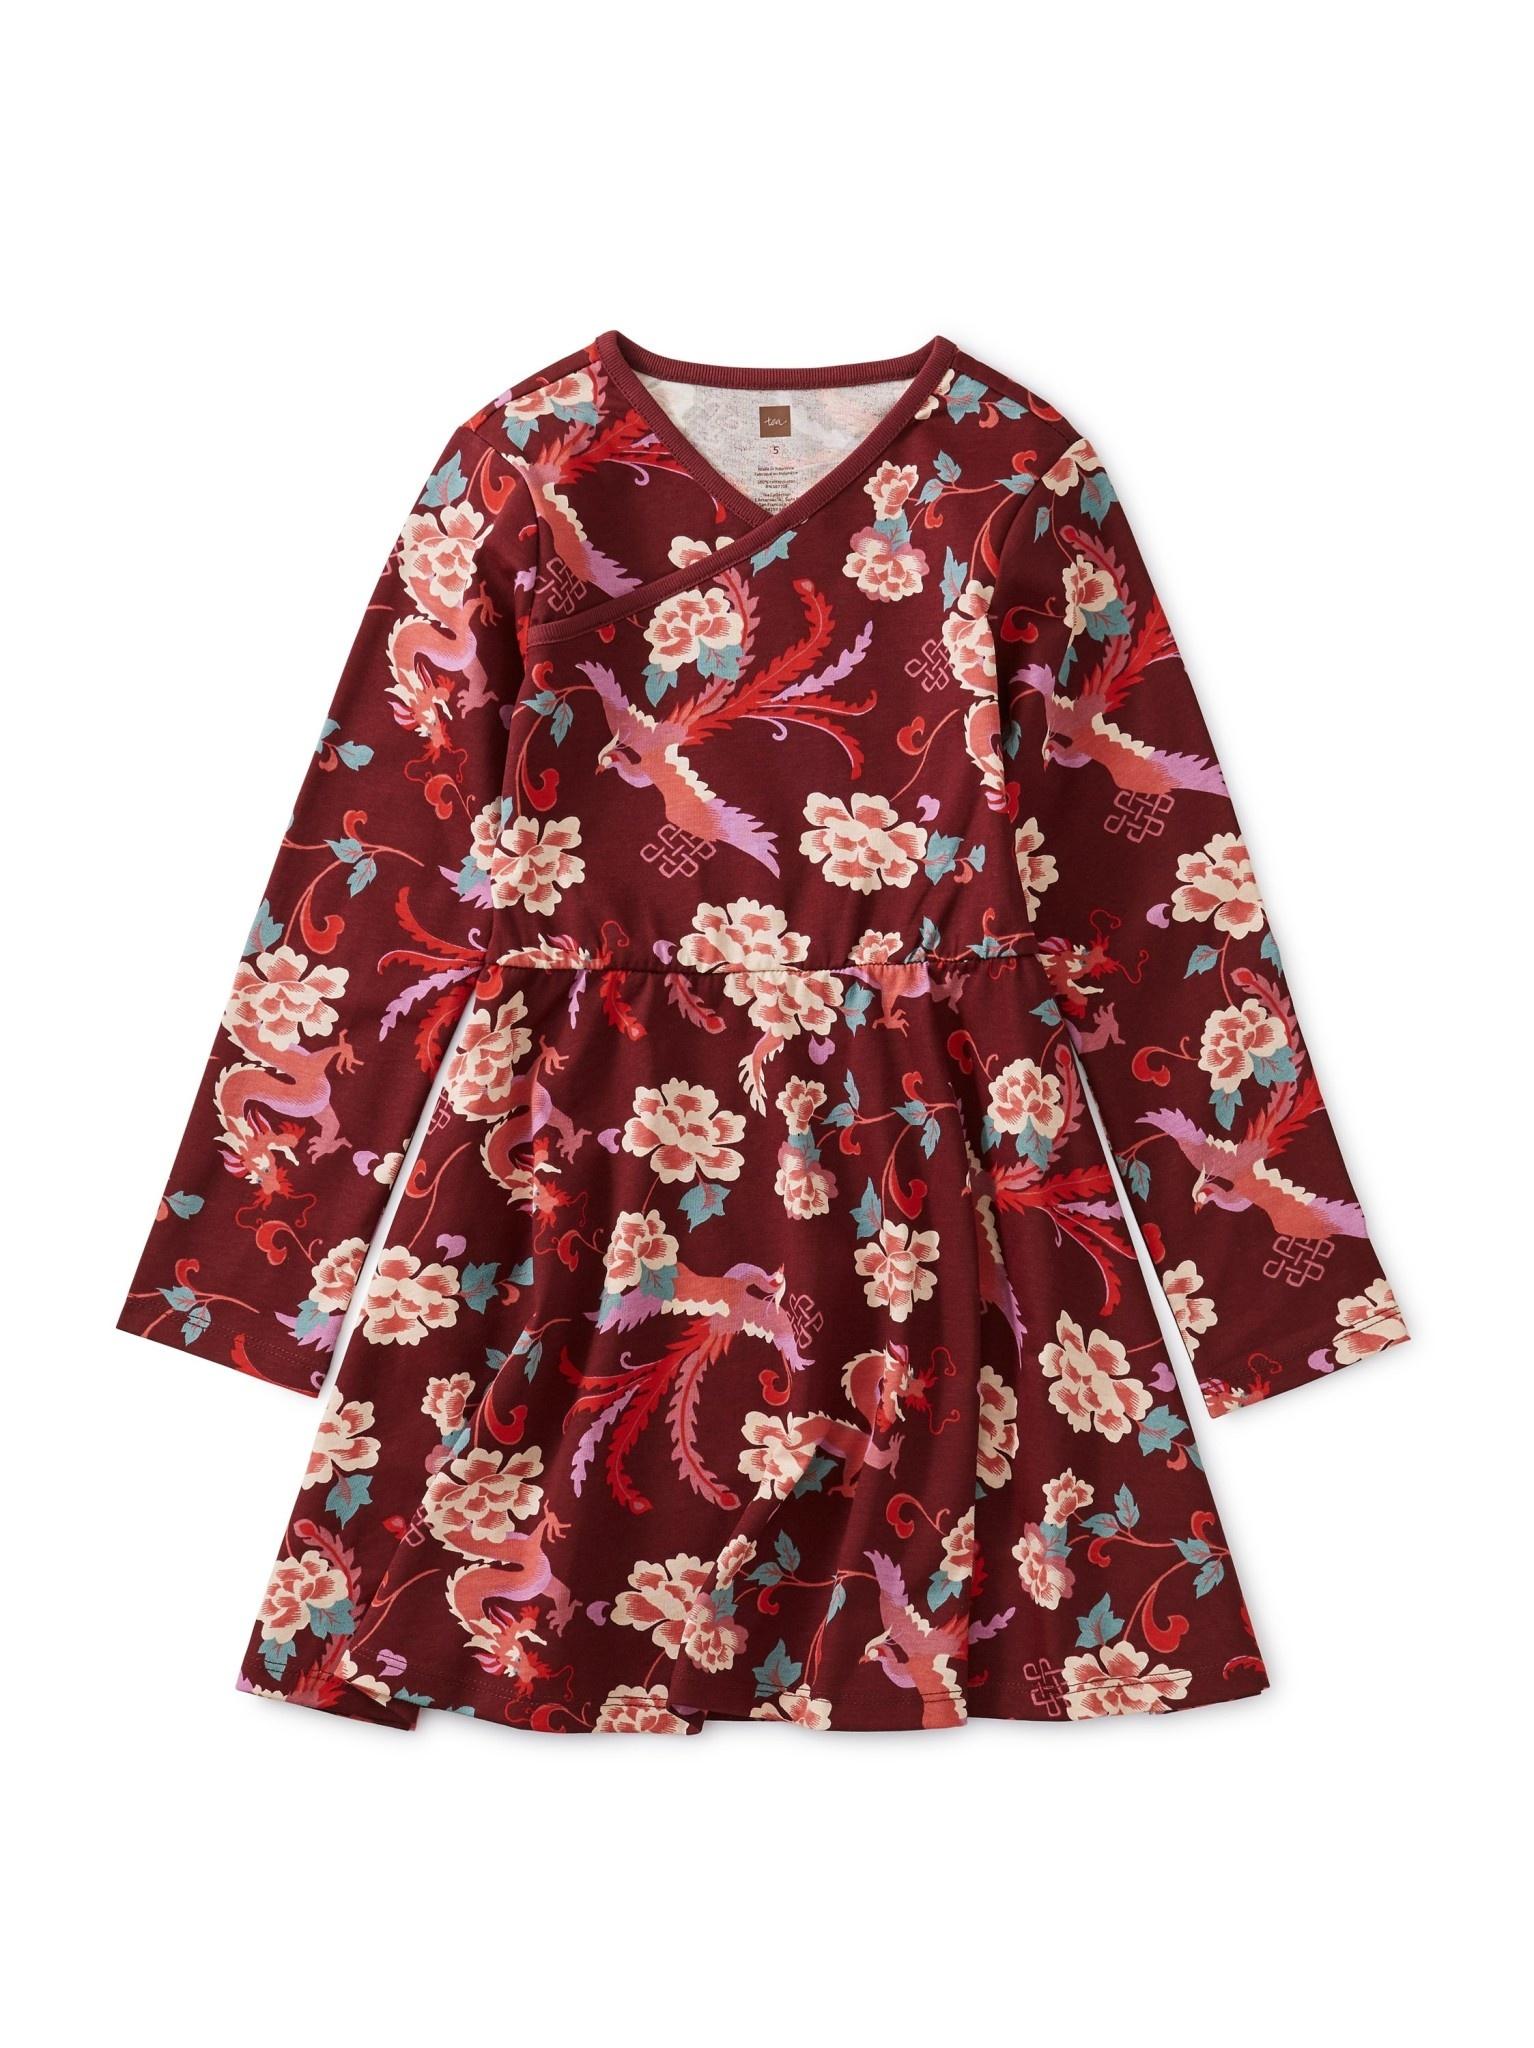 Tea Collection Full Skirt Wrap Neck Dress - Dragon